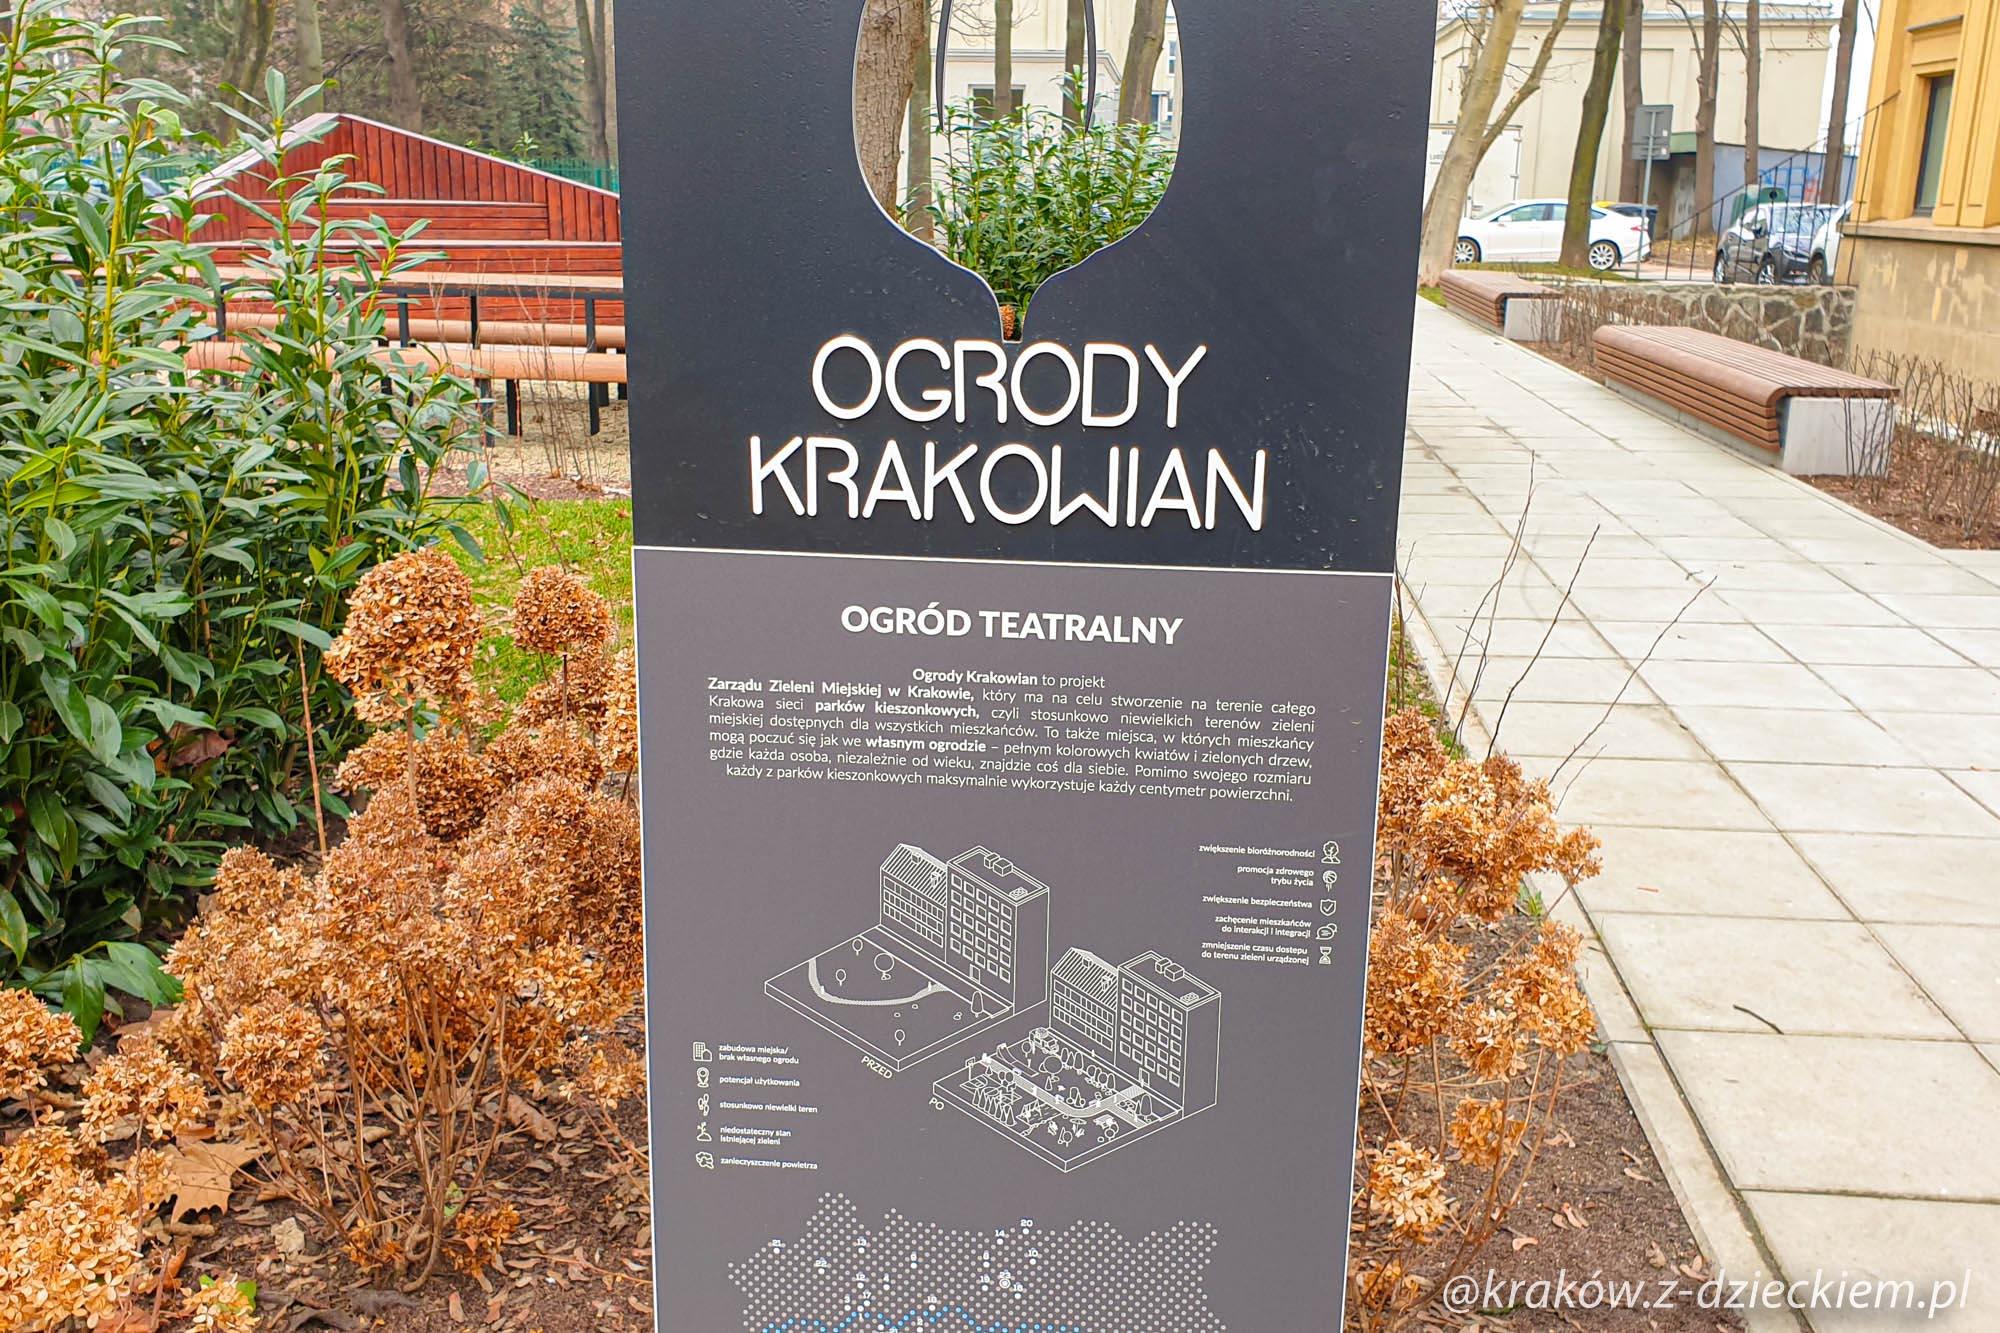 ogrody krakowian